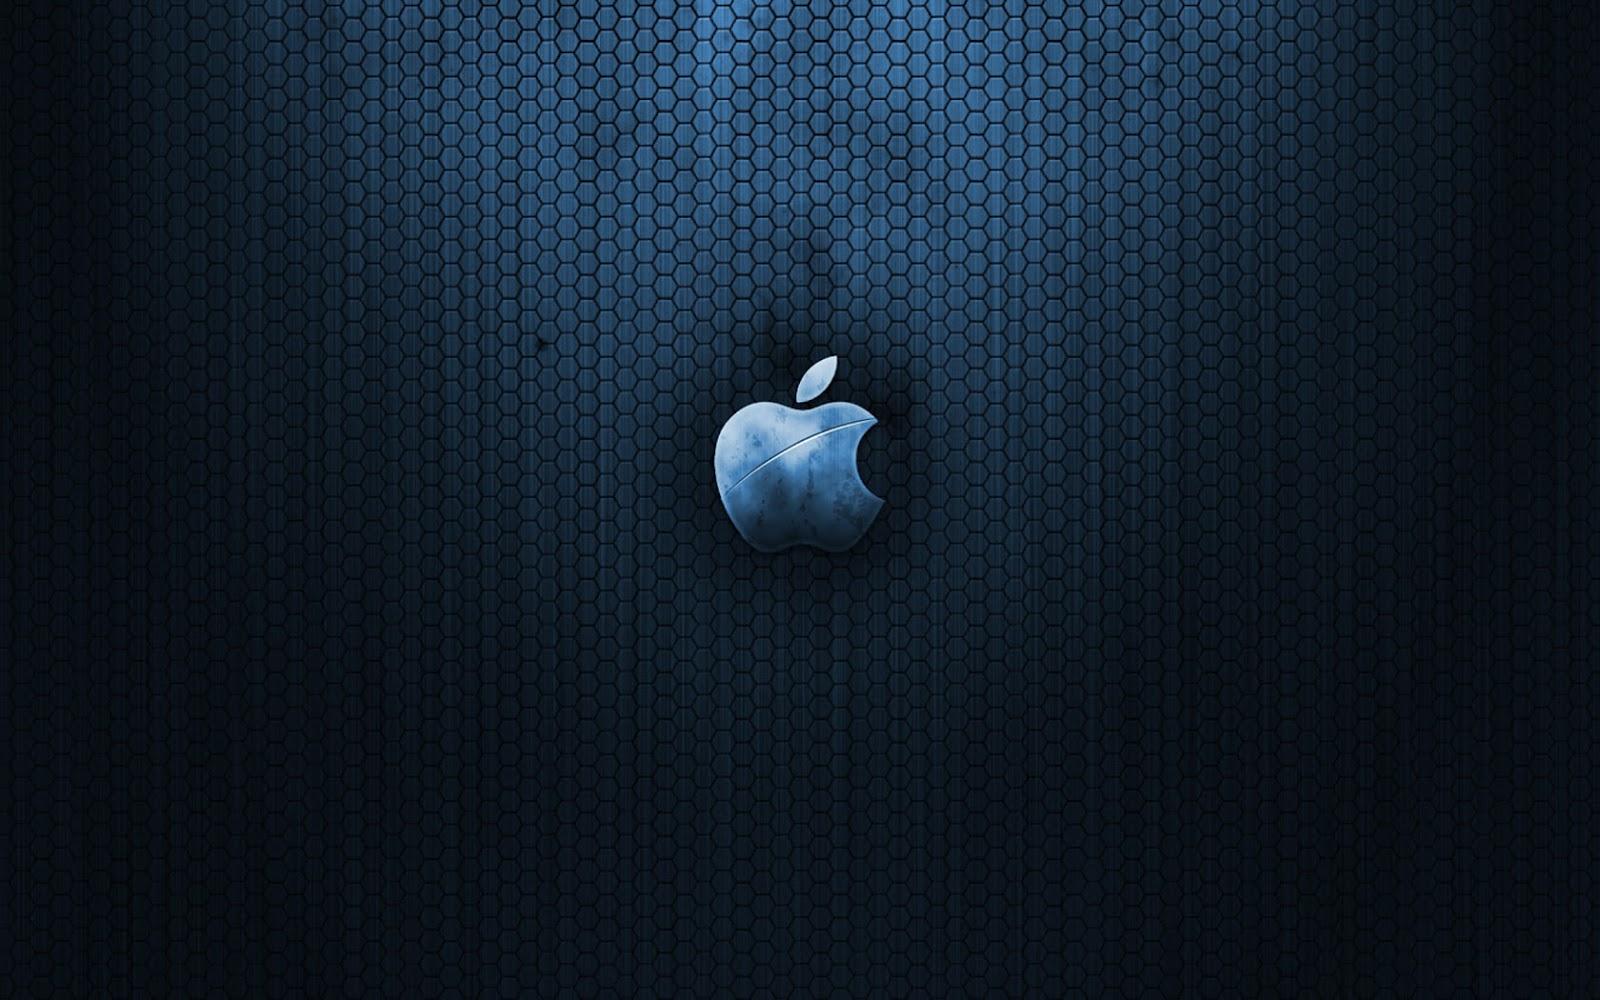 Colorful Apple Machine Wallpaper